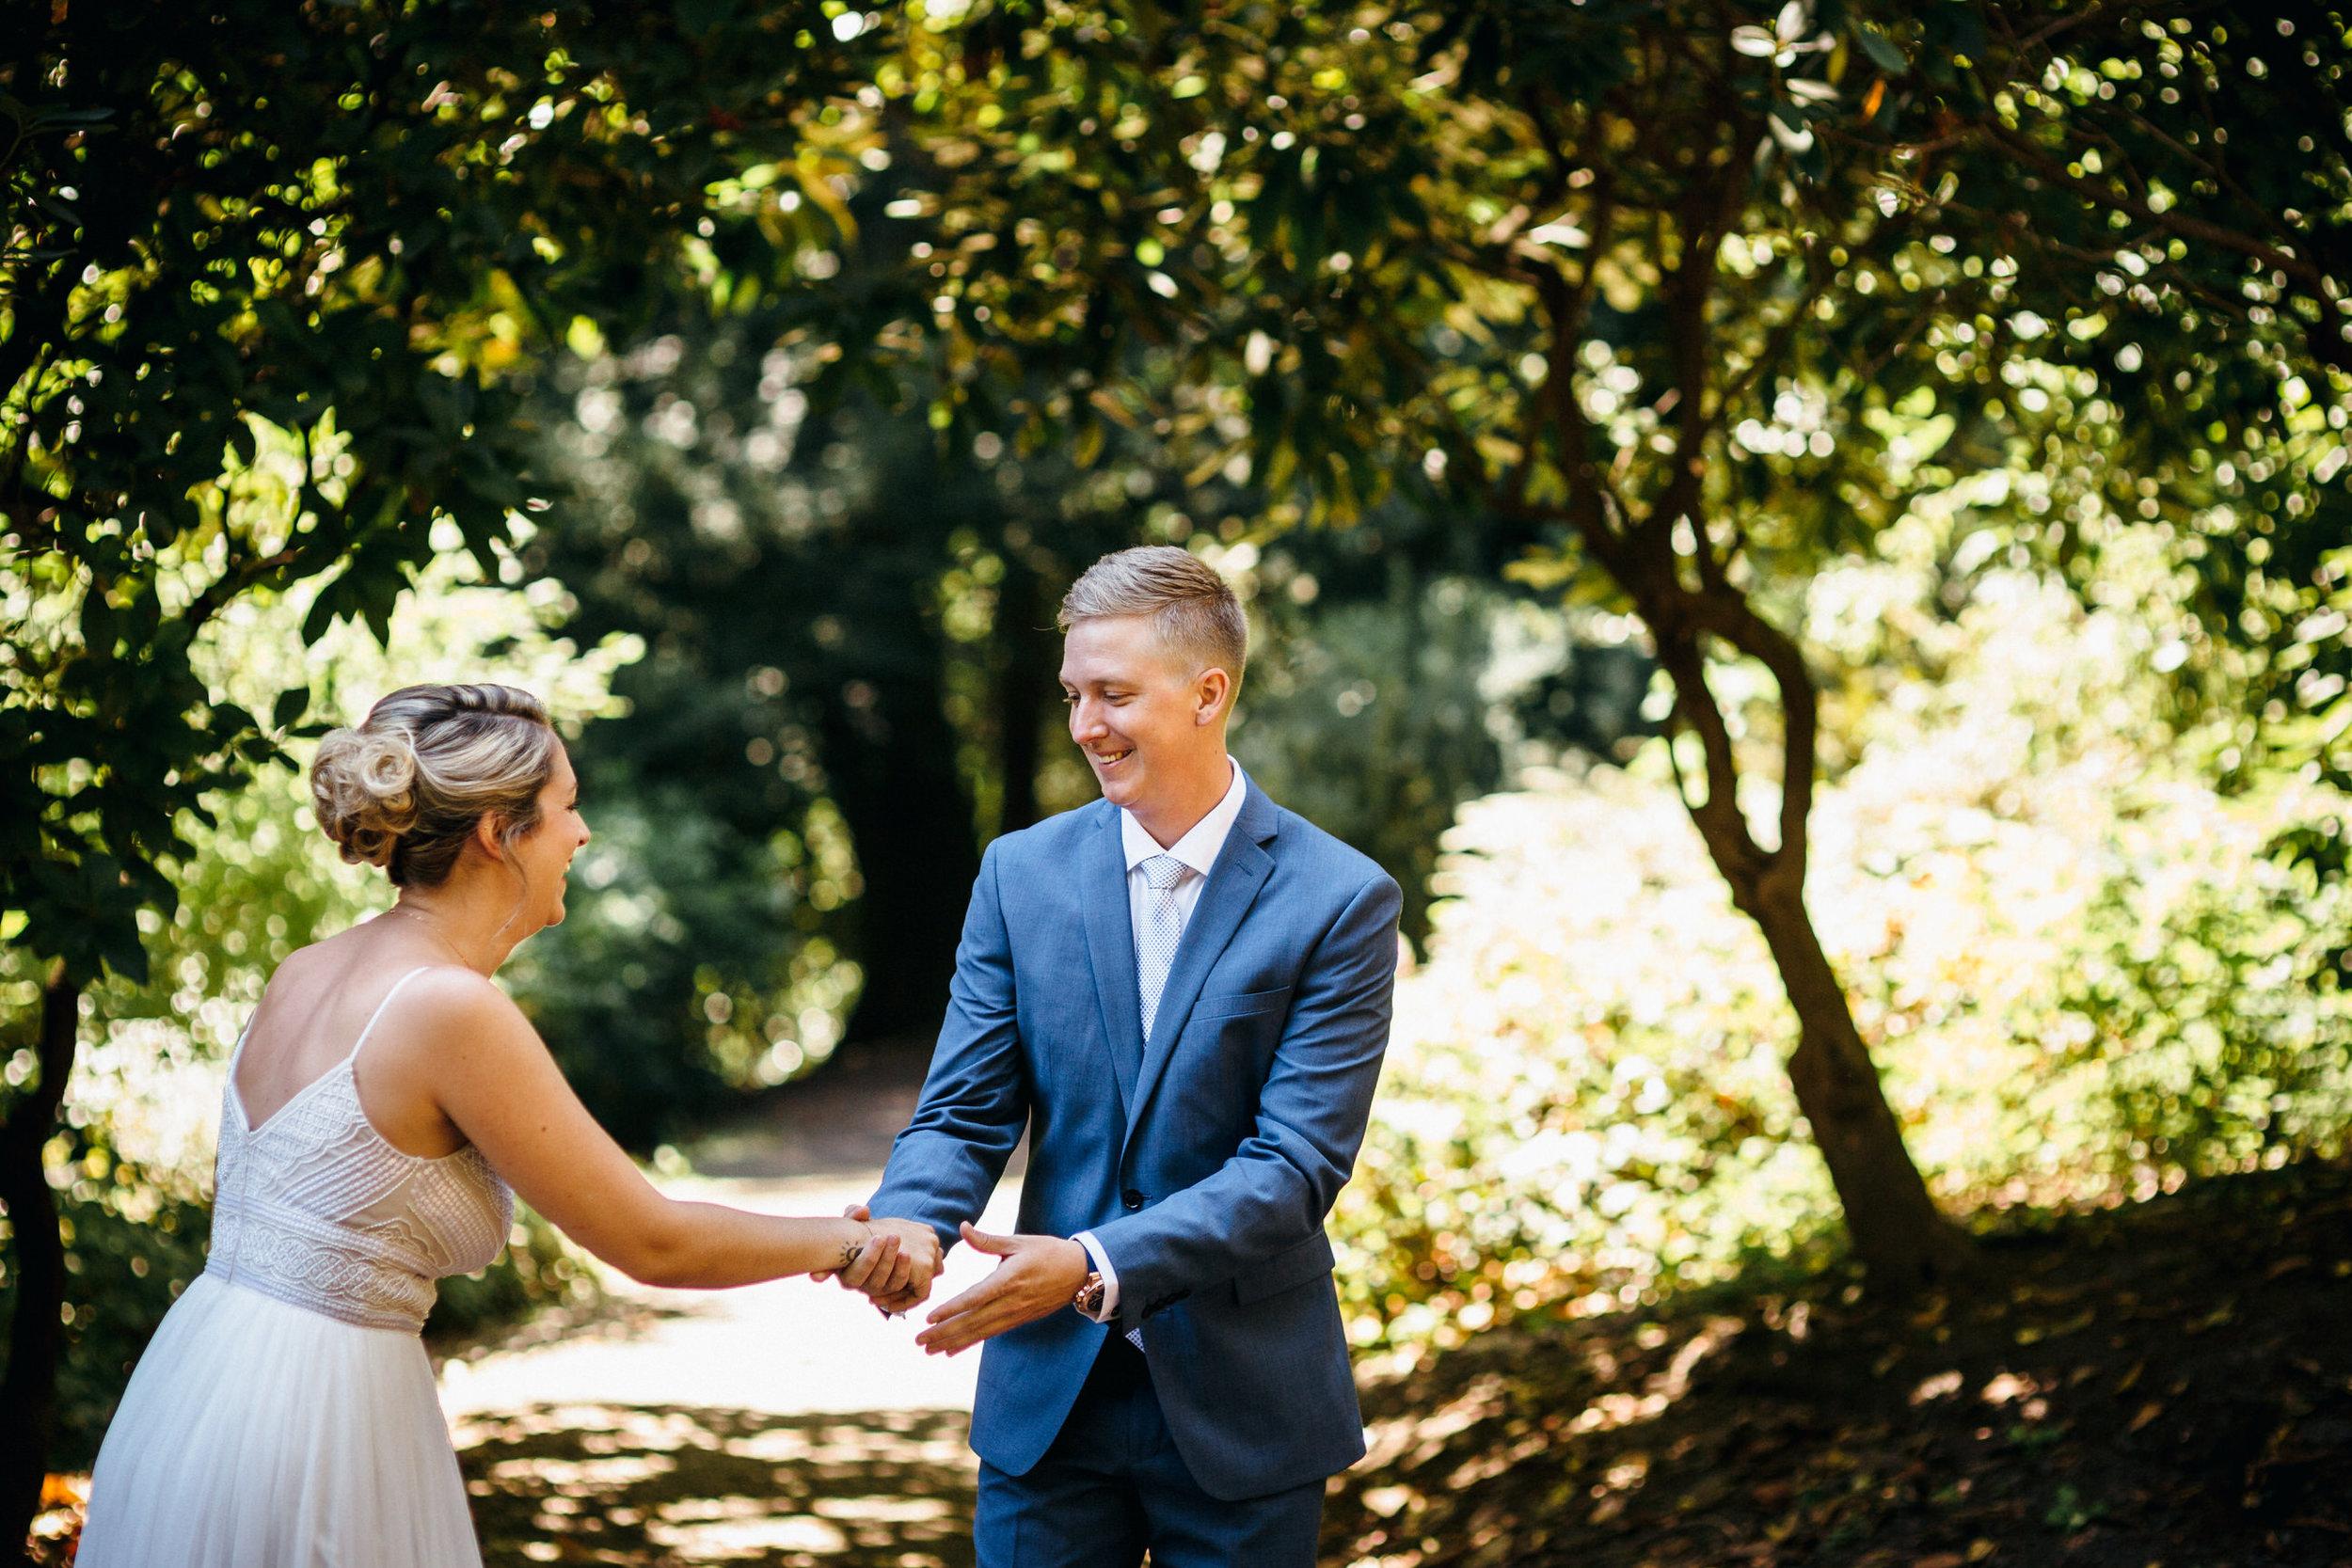 Laurelhurst Park club wedding photographer Portand pdx Oregon027.JPG